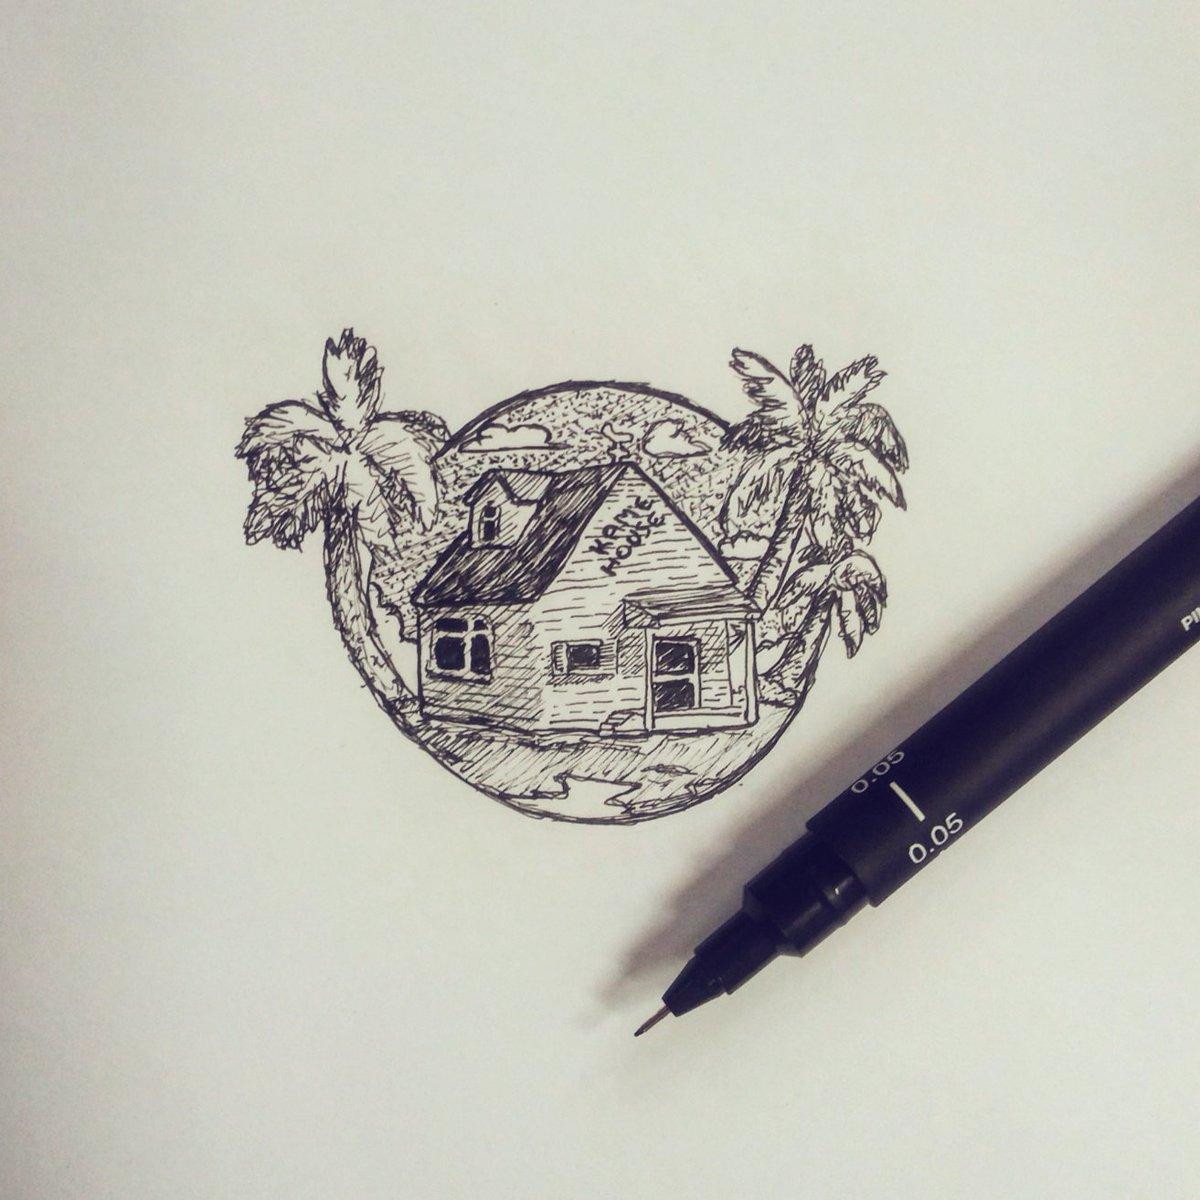 Kame House #illustration #dragonball #sketchbook https://t.co/0YvBYMDUz0